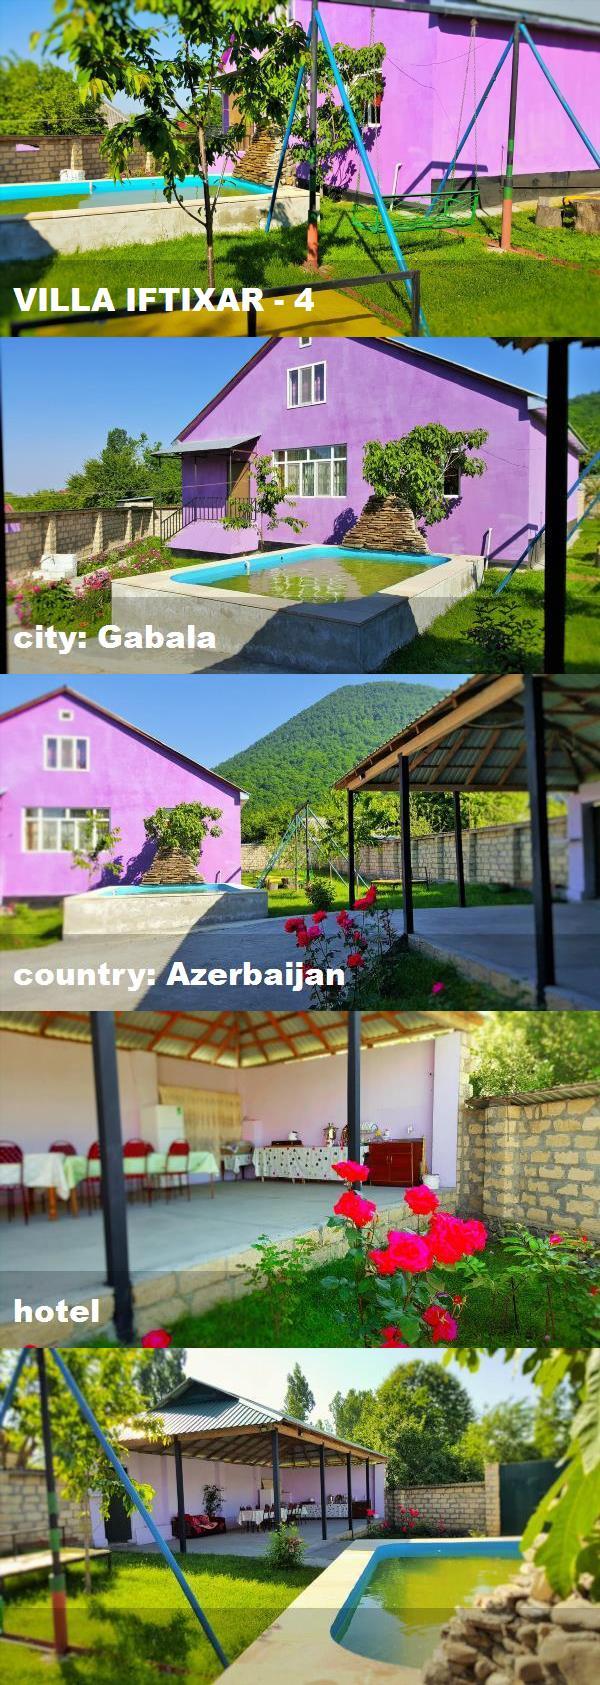 Villa Iftixar 4 City Gabala Country Azerbaijan Hotel Resort Hotel Villa